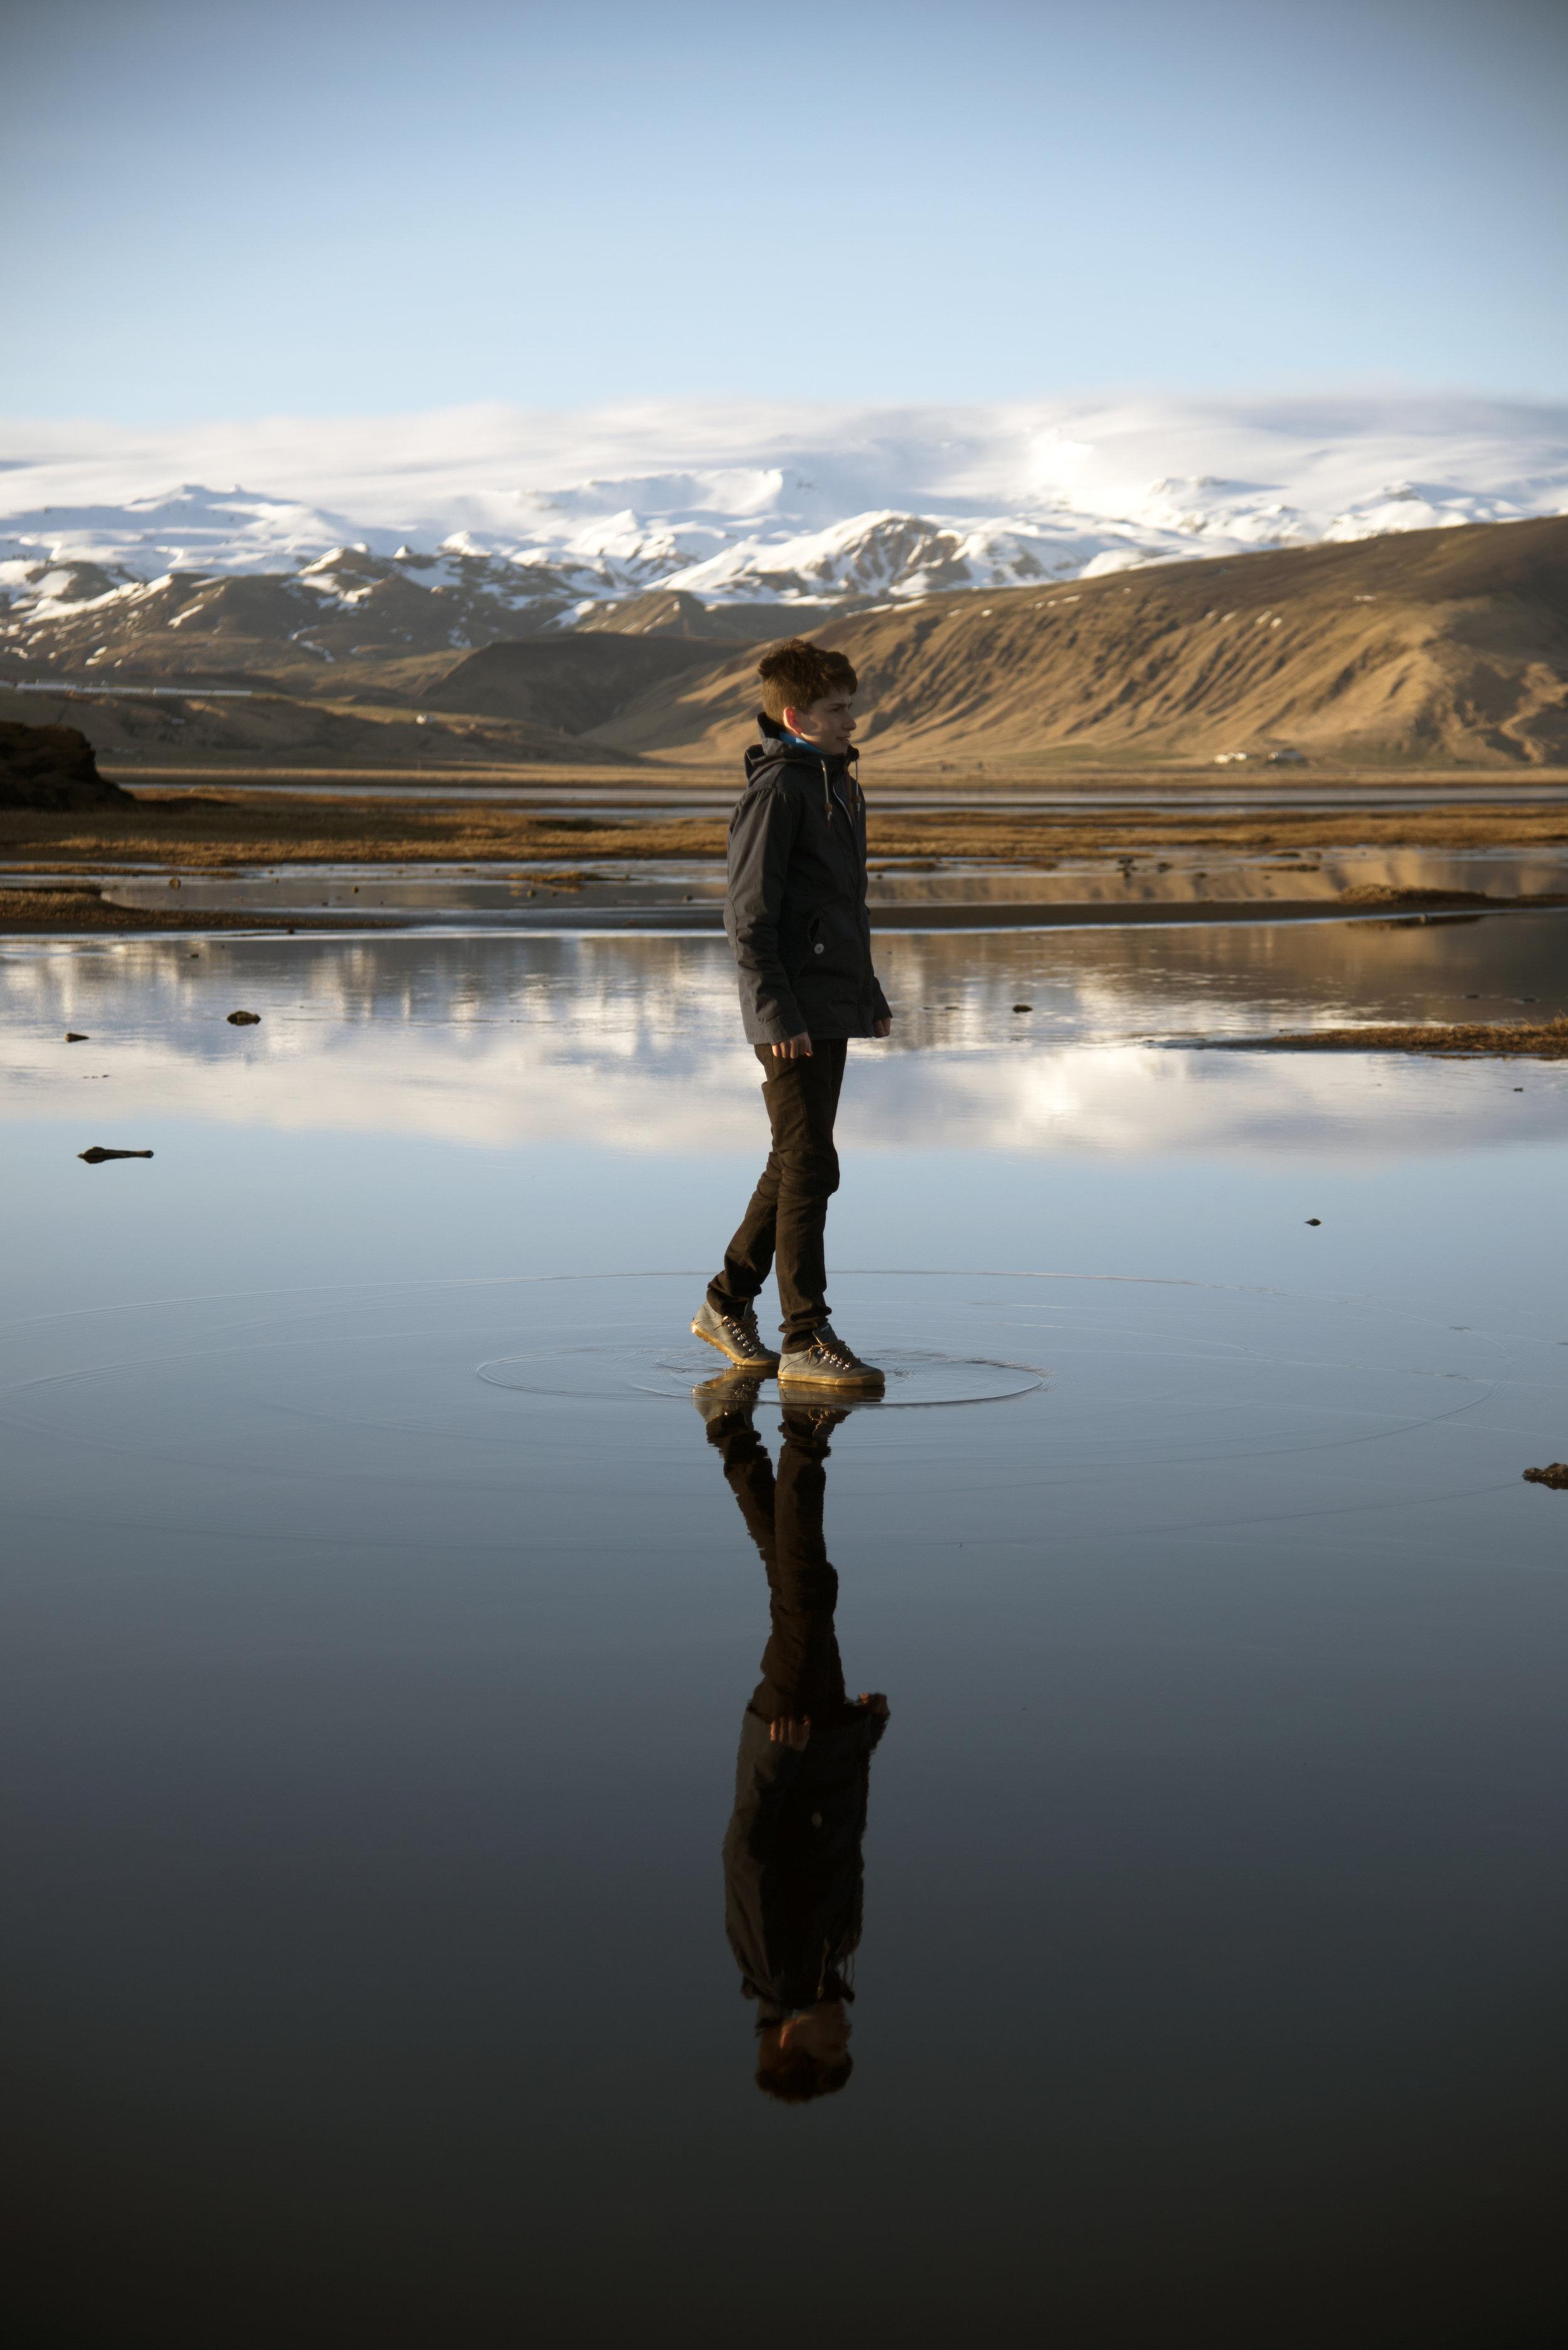 Joe Standing on Reflection in Iceland.jpg